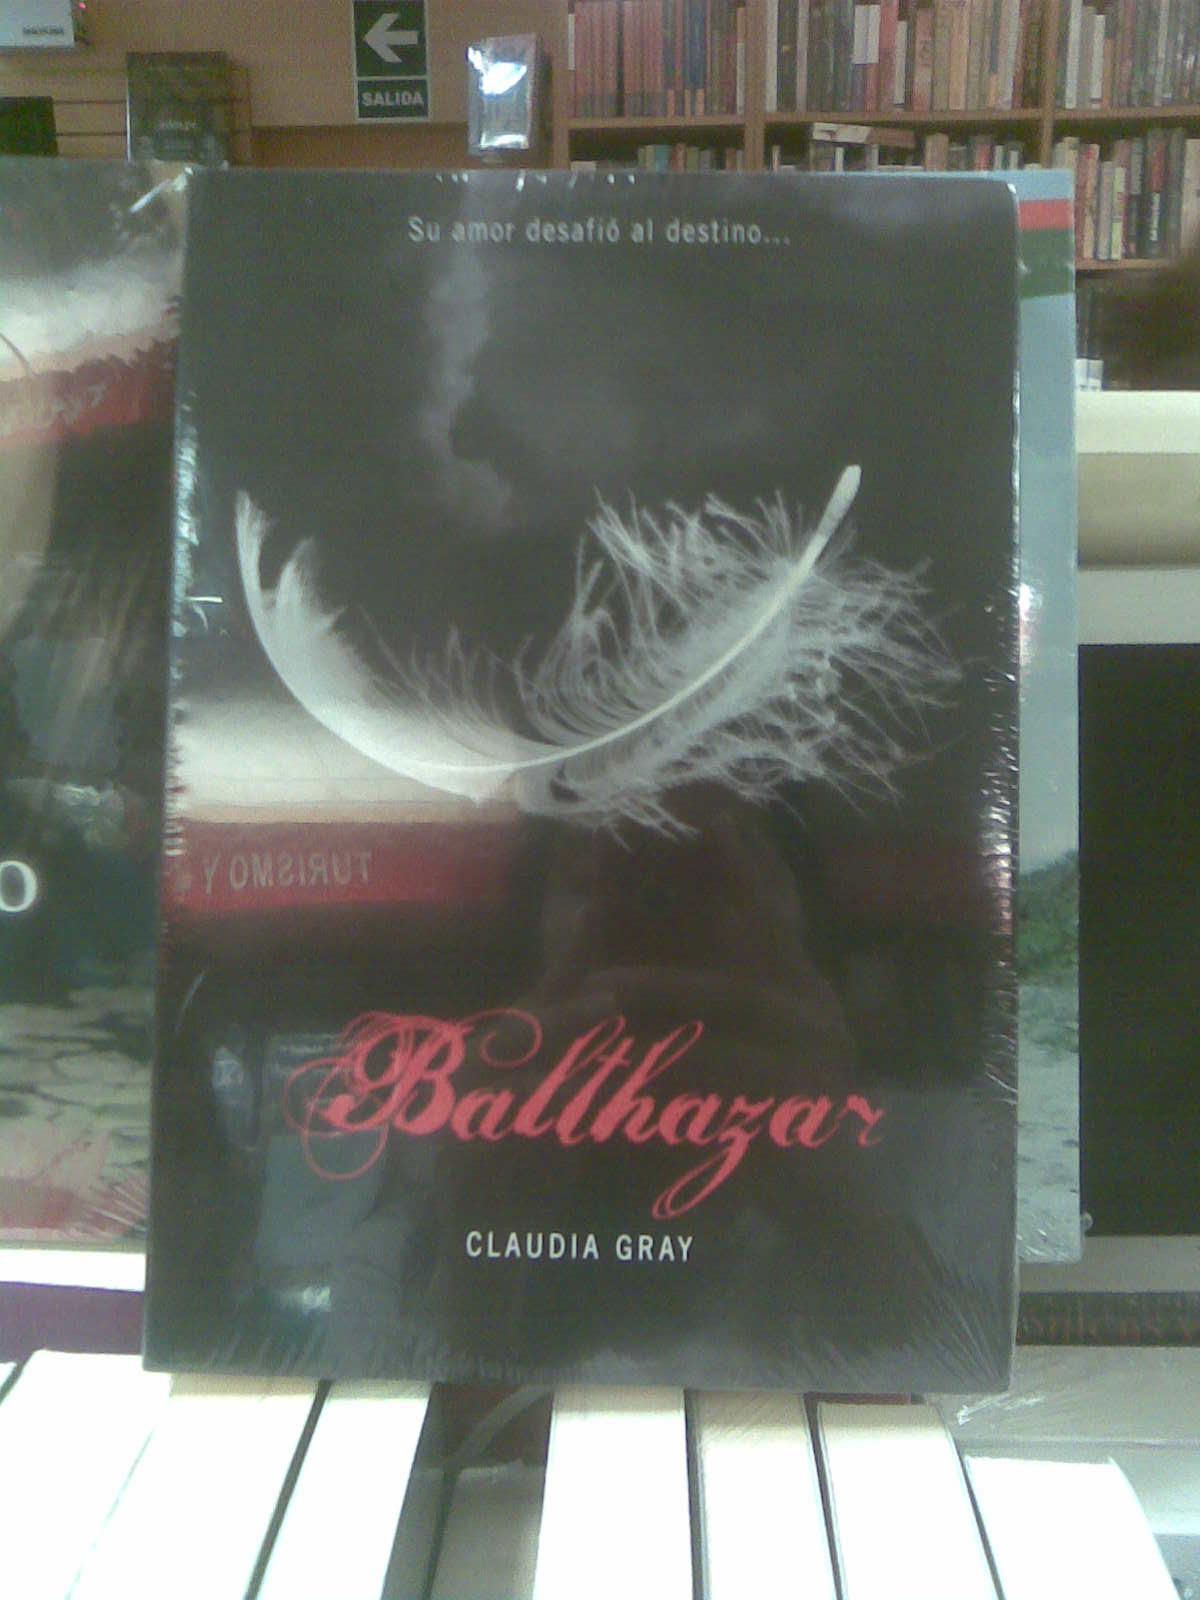 Living In Your Own World Ya En Librer 237 As 1 Ibero Y border=